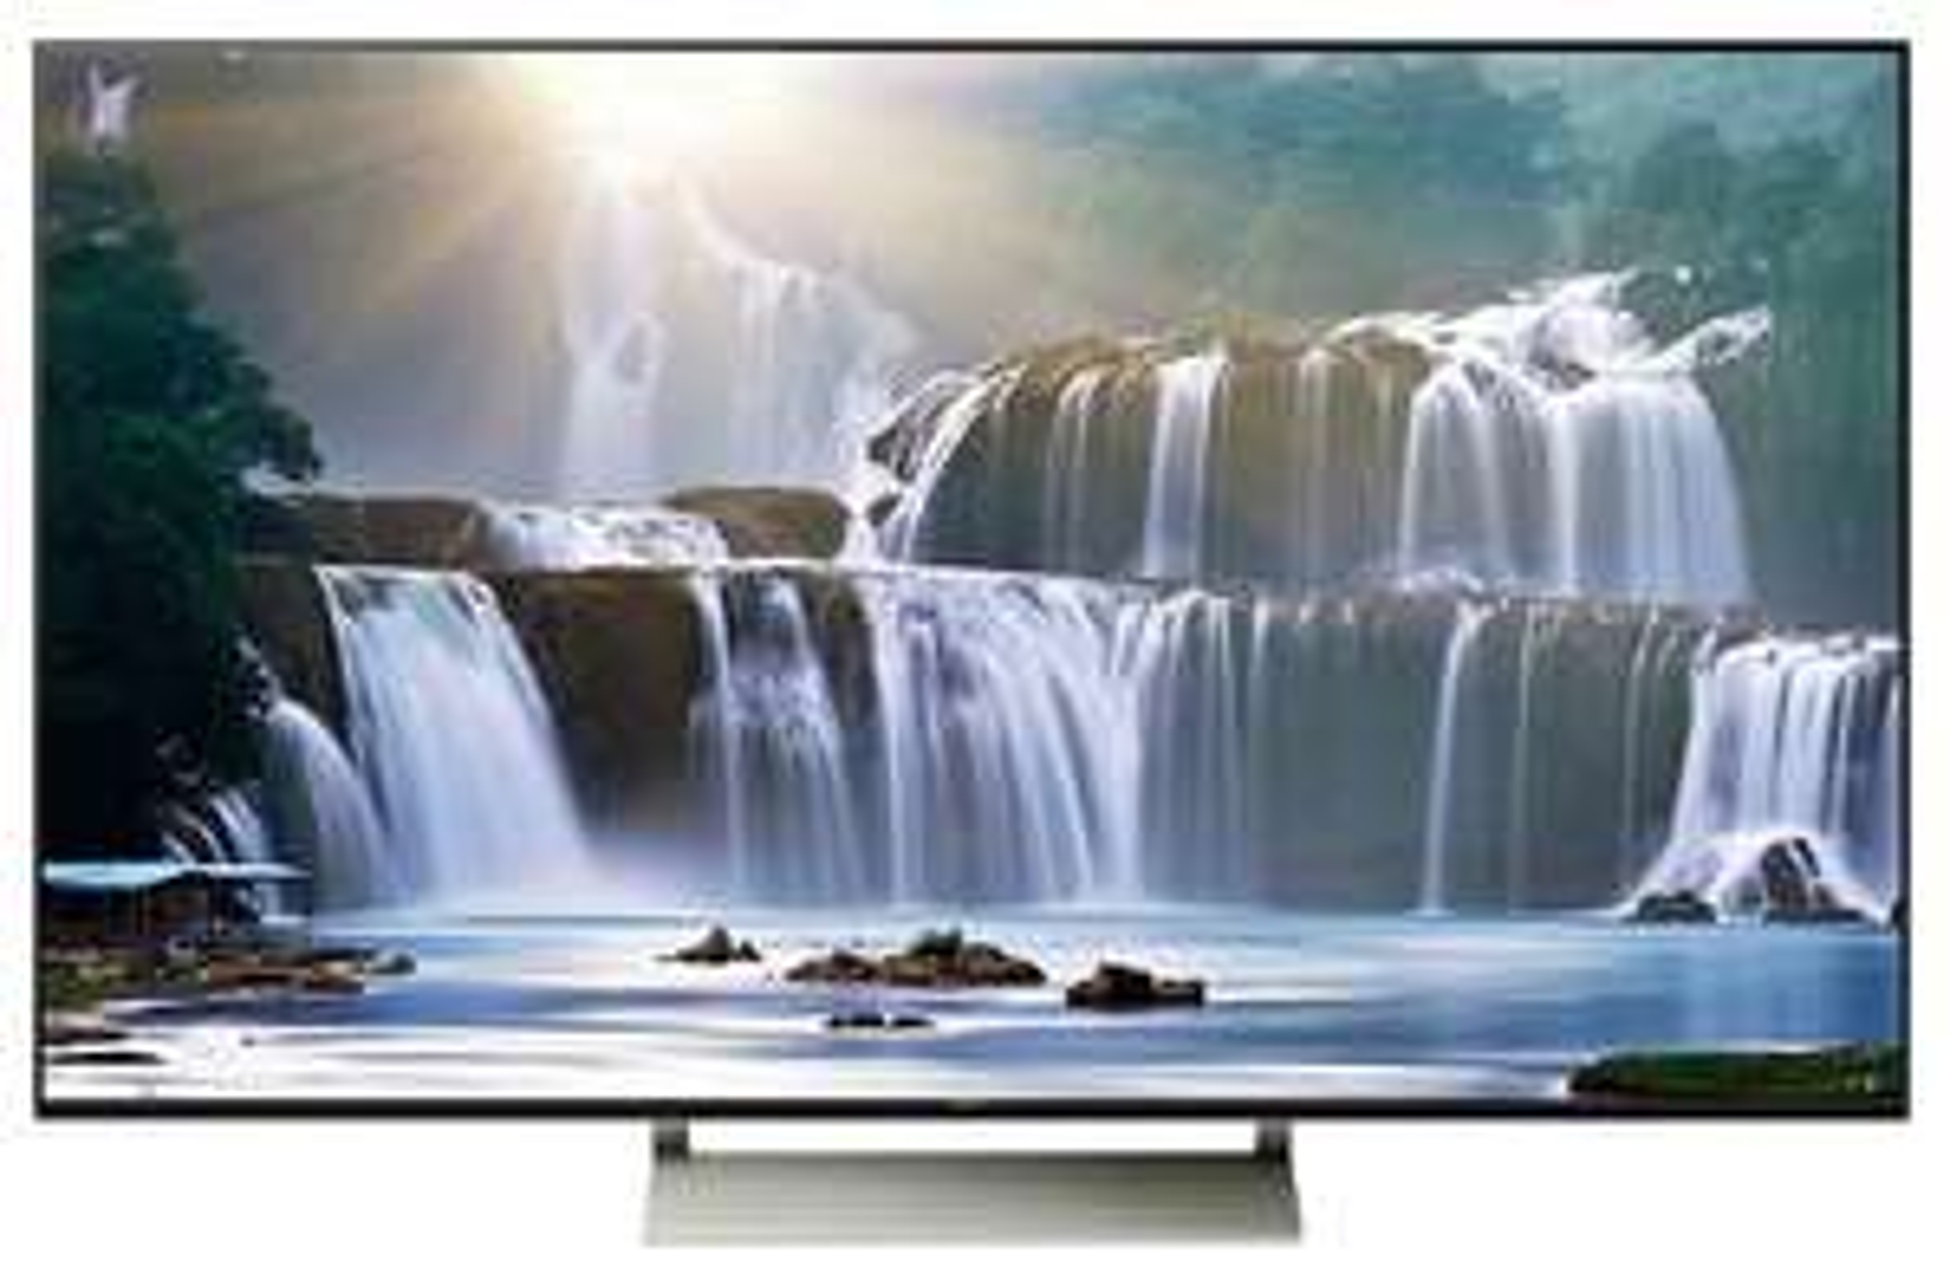 Sony BRAVIA KD55XE9305 £999 @ John Lewis Brent Cross Shopping Mall London. Ex display 5 yr Warranty